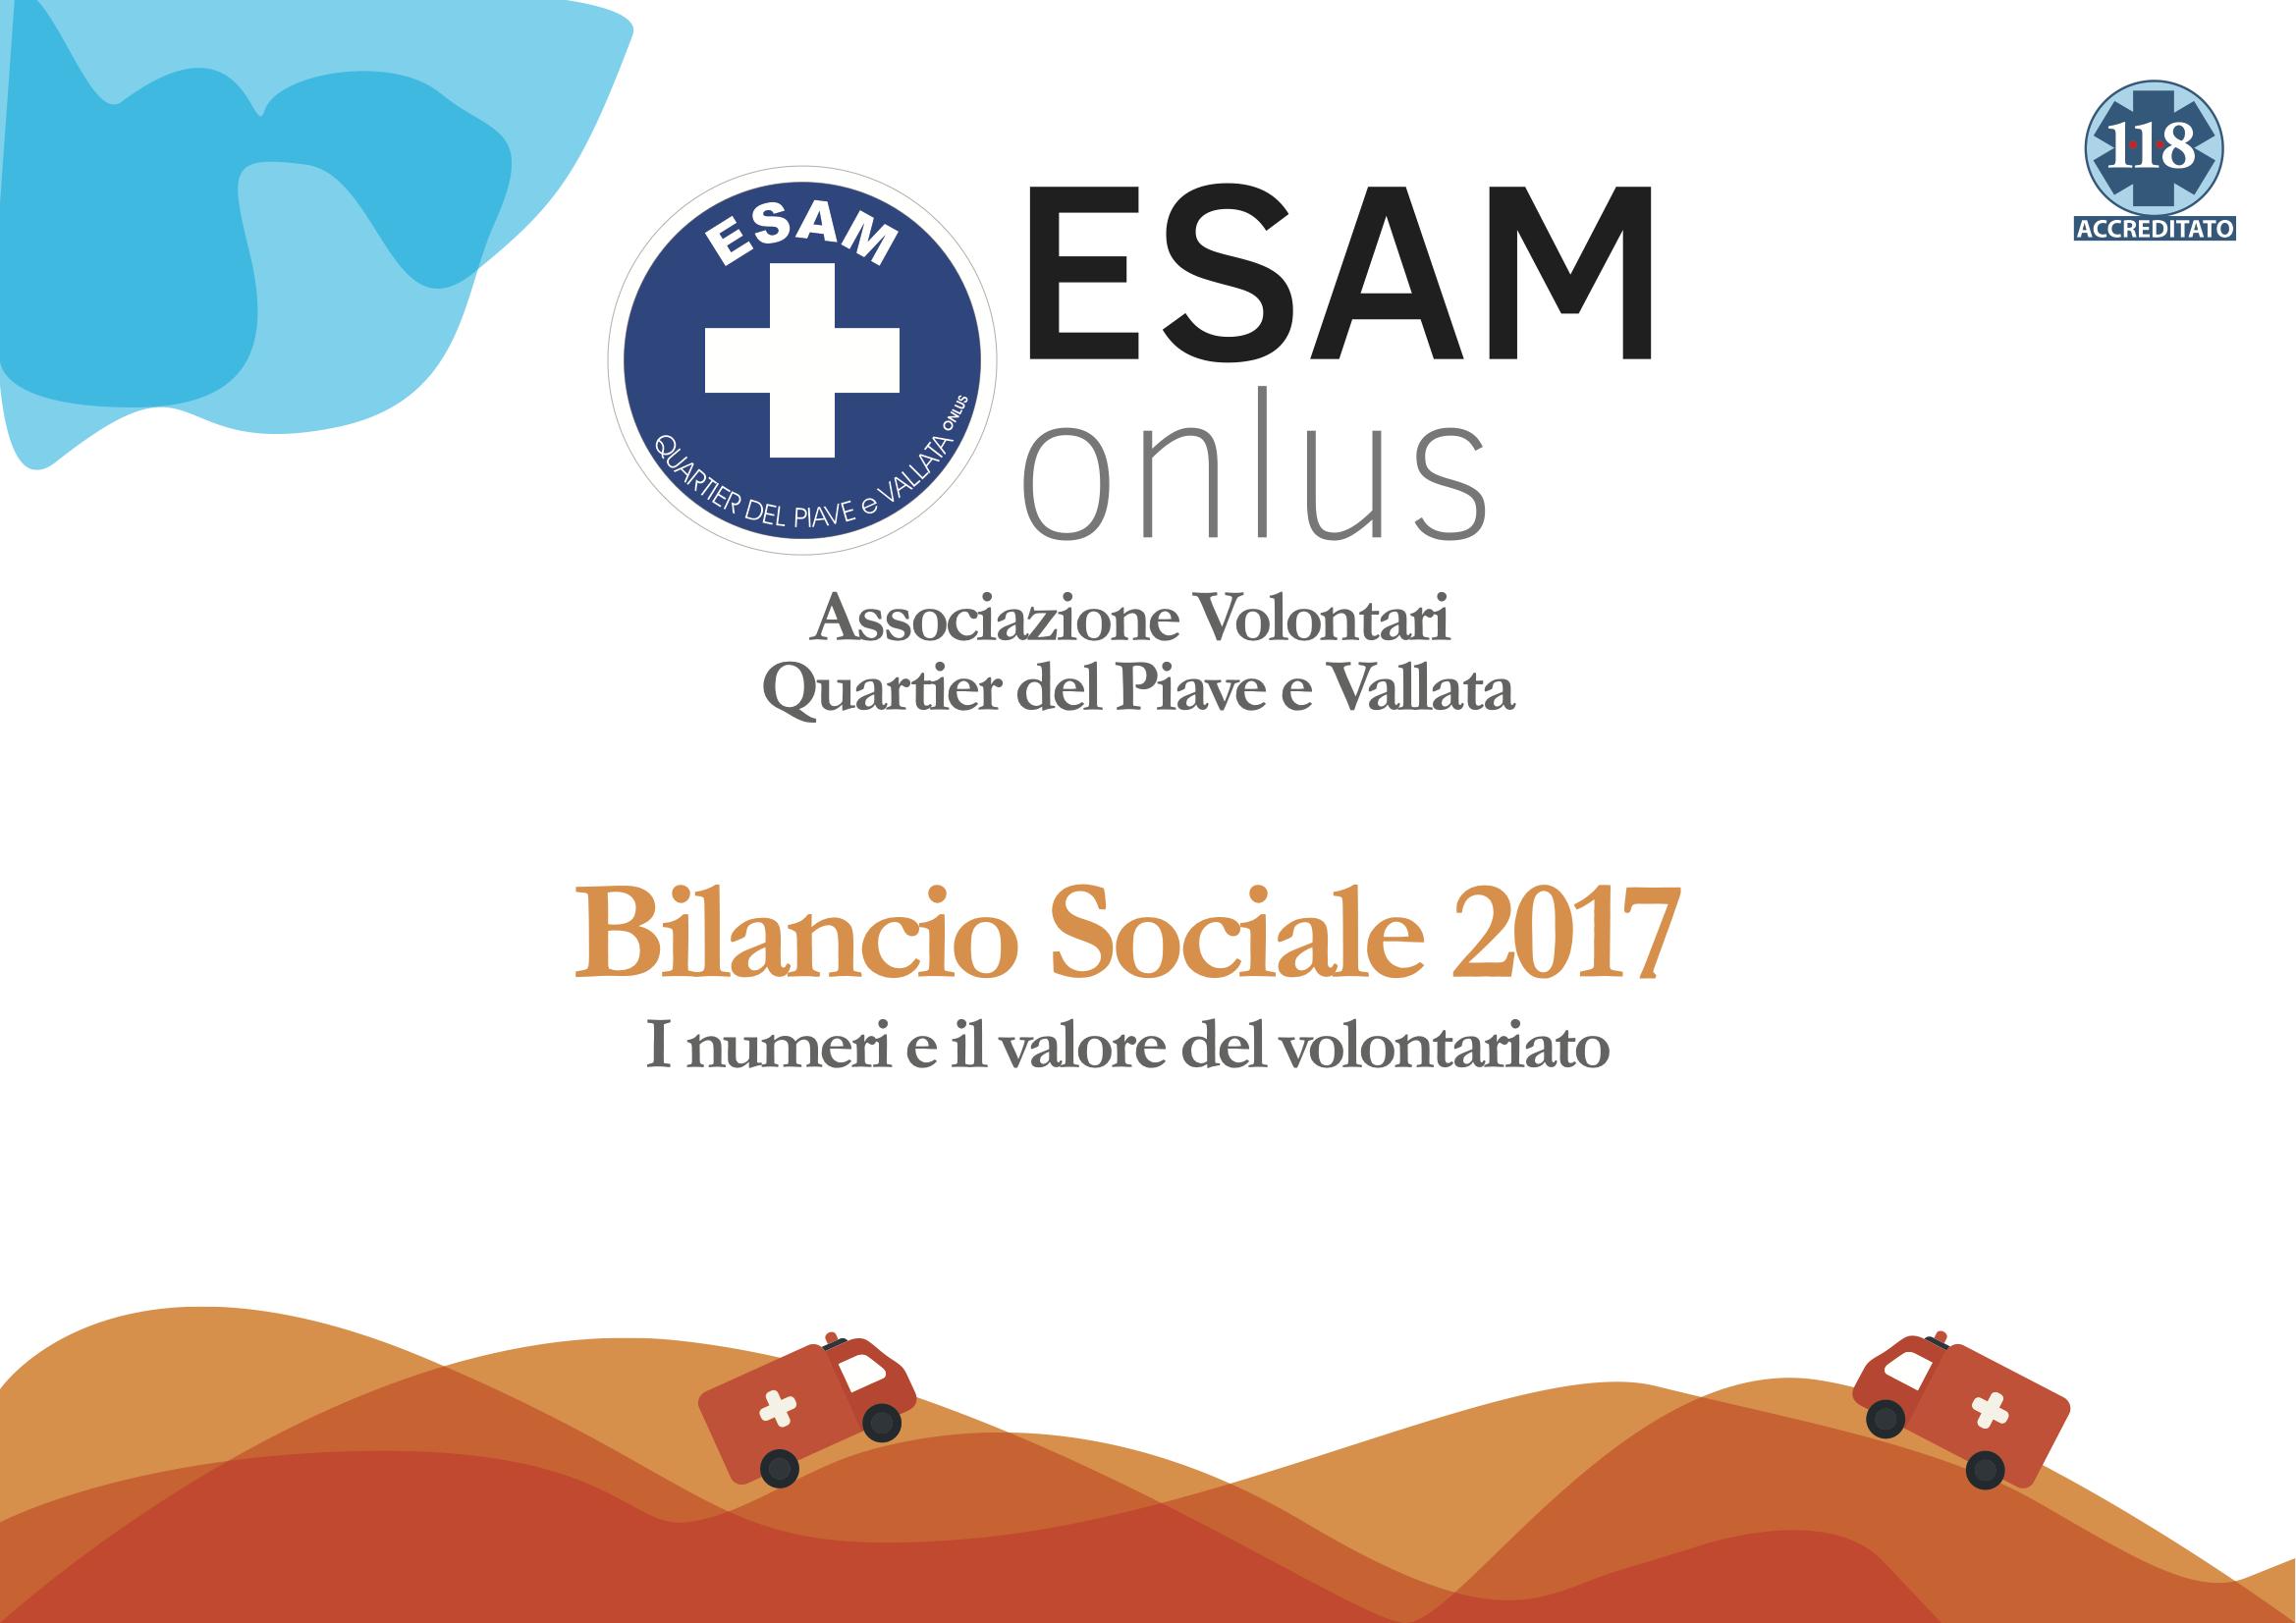 Bilancio Sociale - Copertina